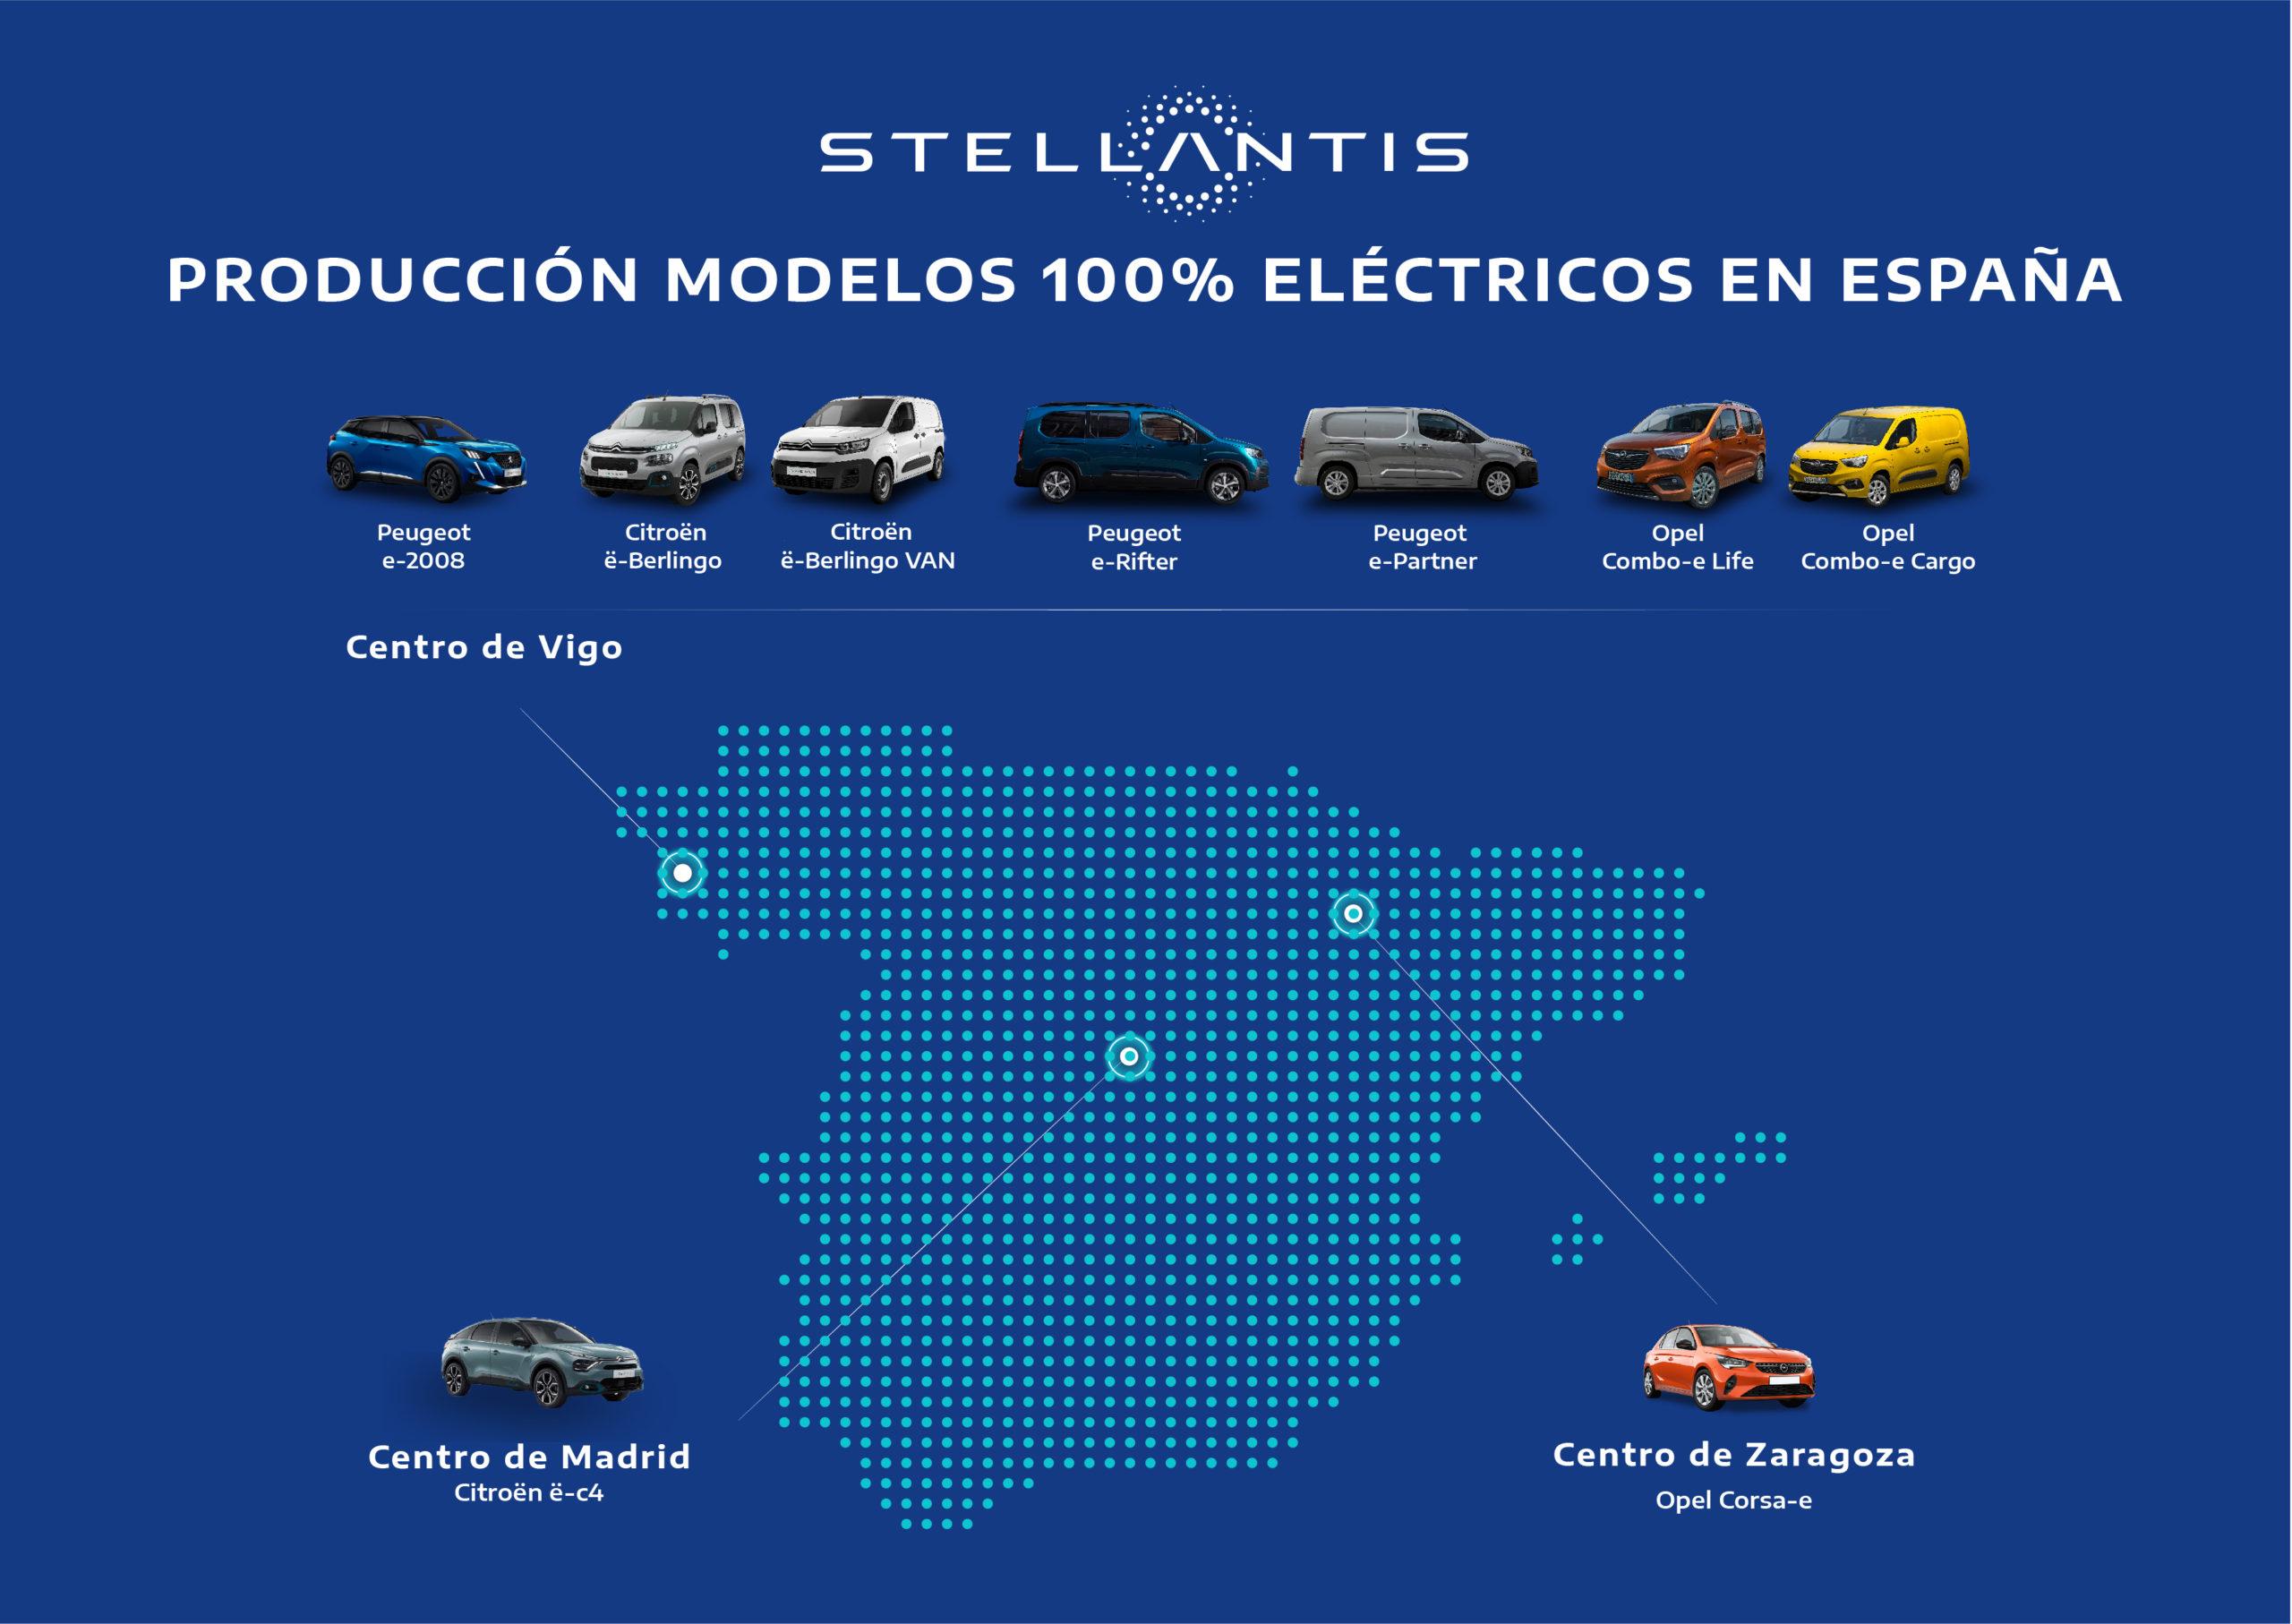 Stellantis líder mundial en Movilidad Sostenible